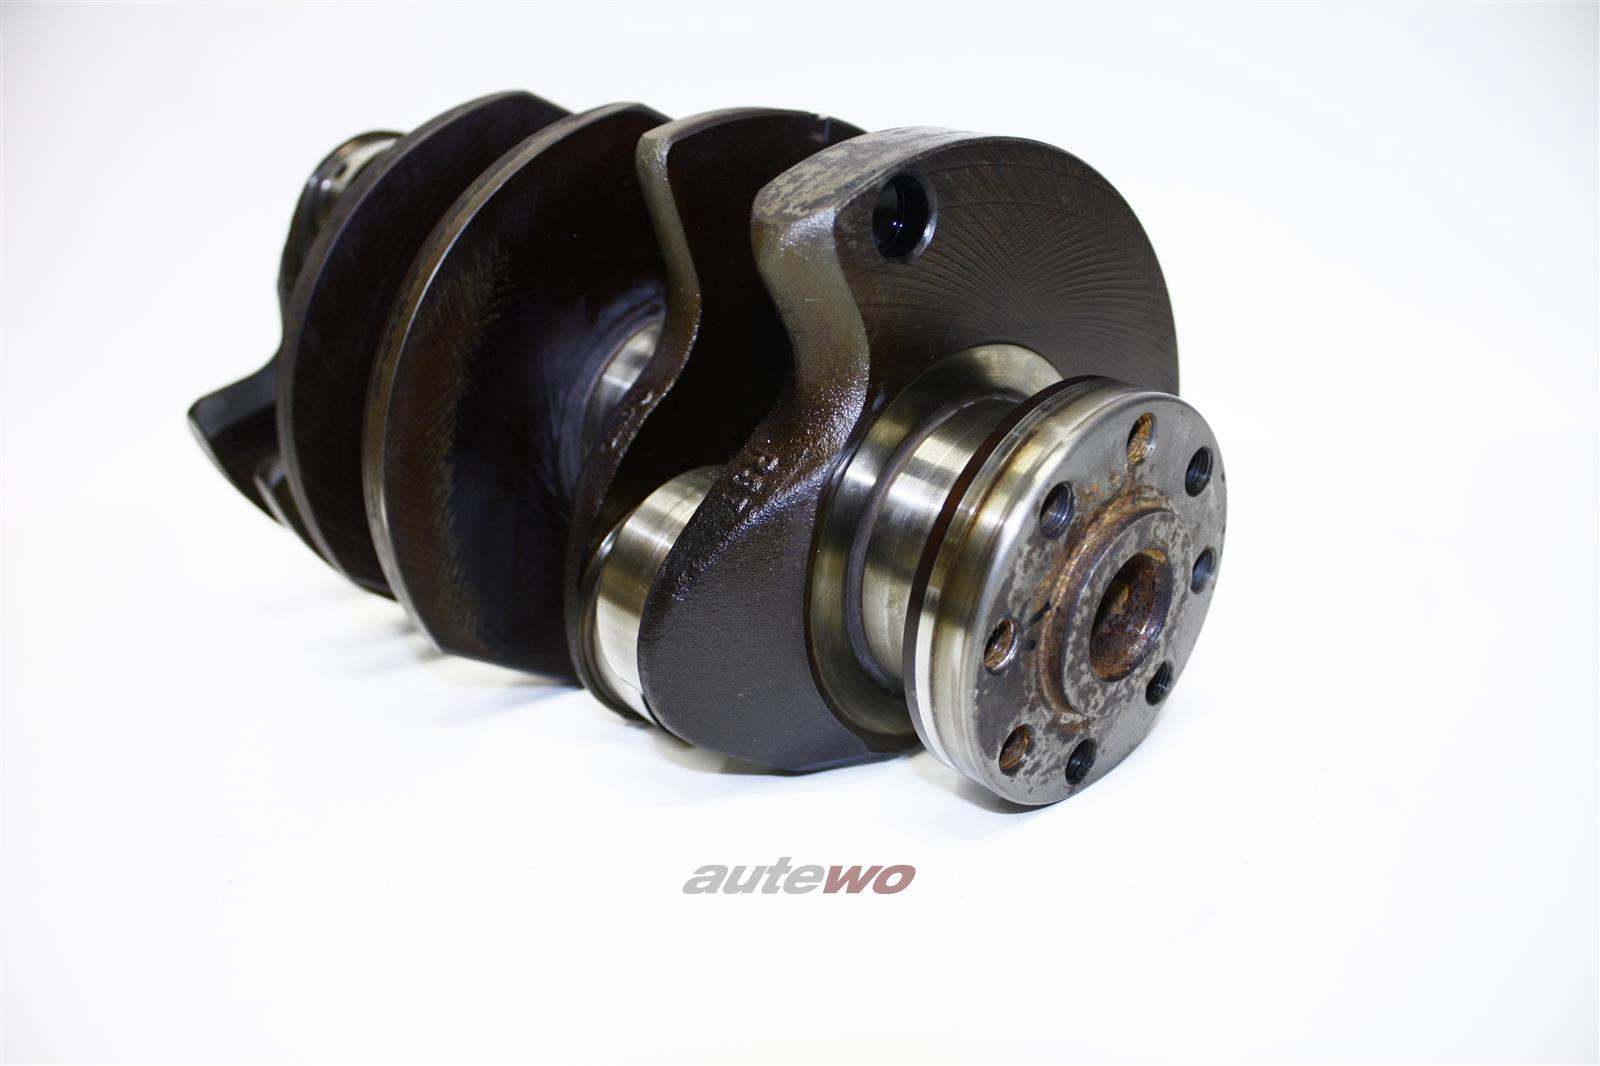 Audi 80/100/A4/A6 C4 2.6l 150PS ABC Kurbelwelle 078105101AC 143000km